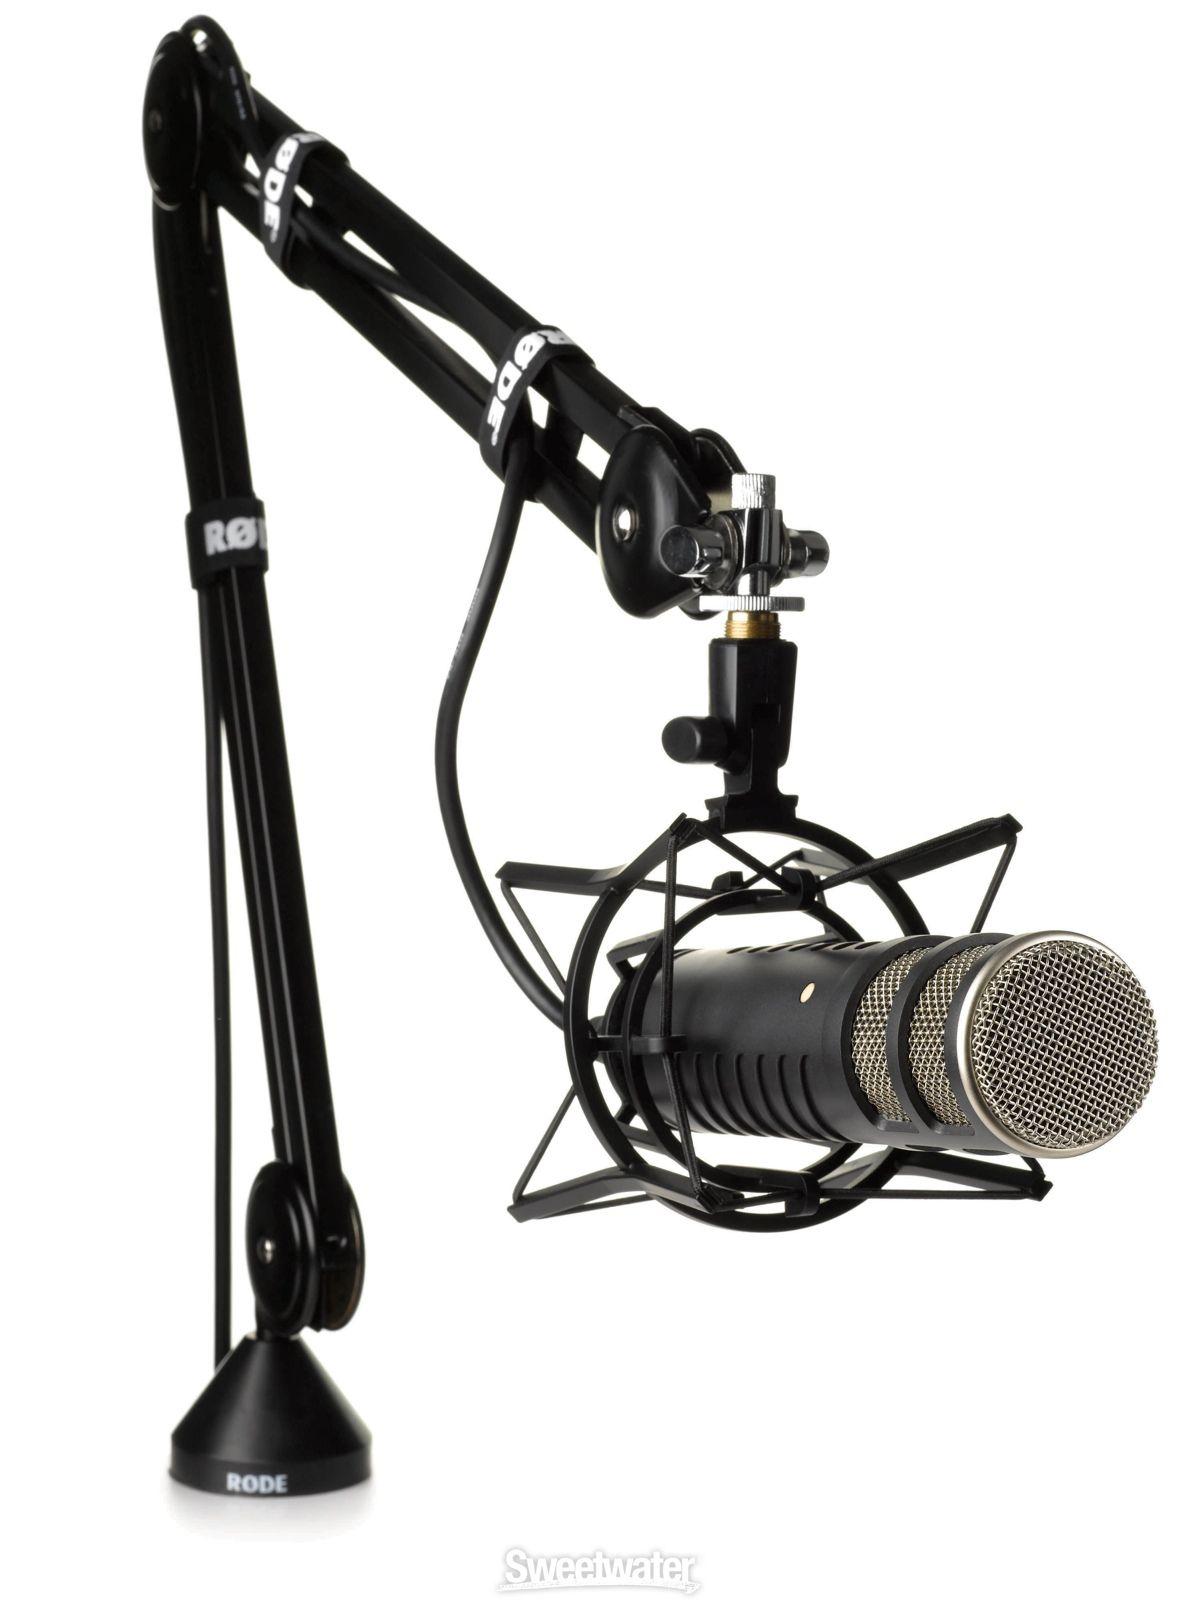 Rode Psa1 Desk Mounted Broadcast Microphone Boom Arm Microphone Recording Studio Design Recording Studio Home